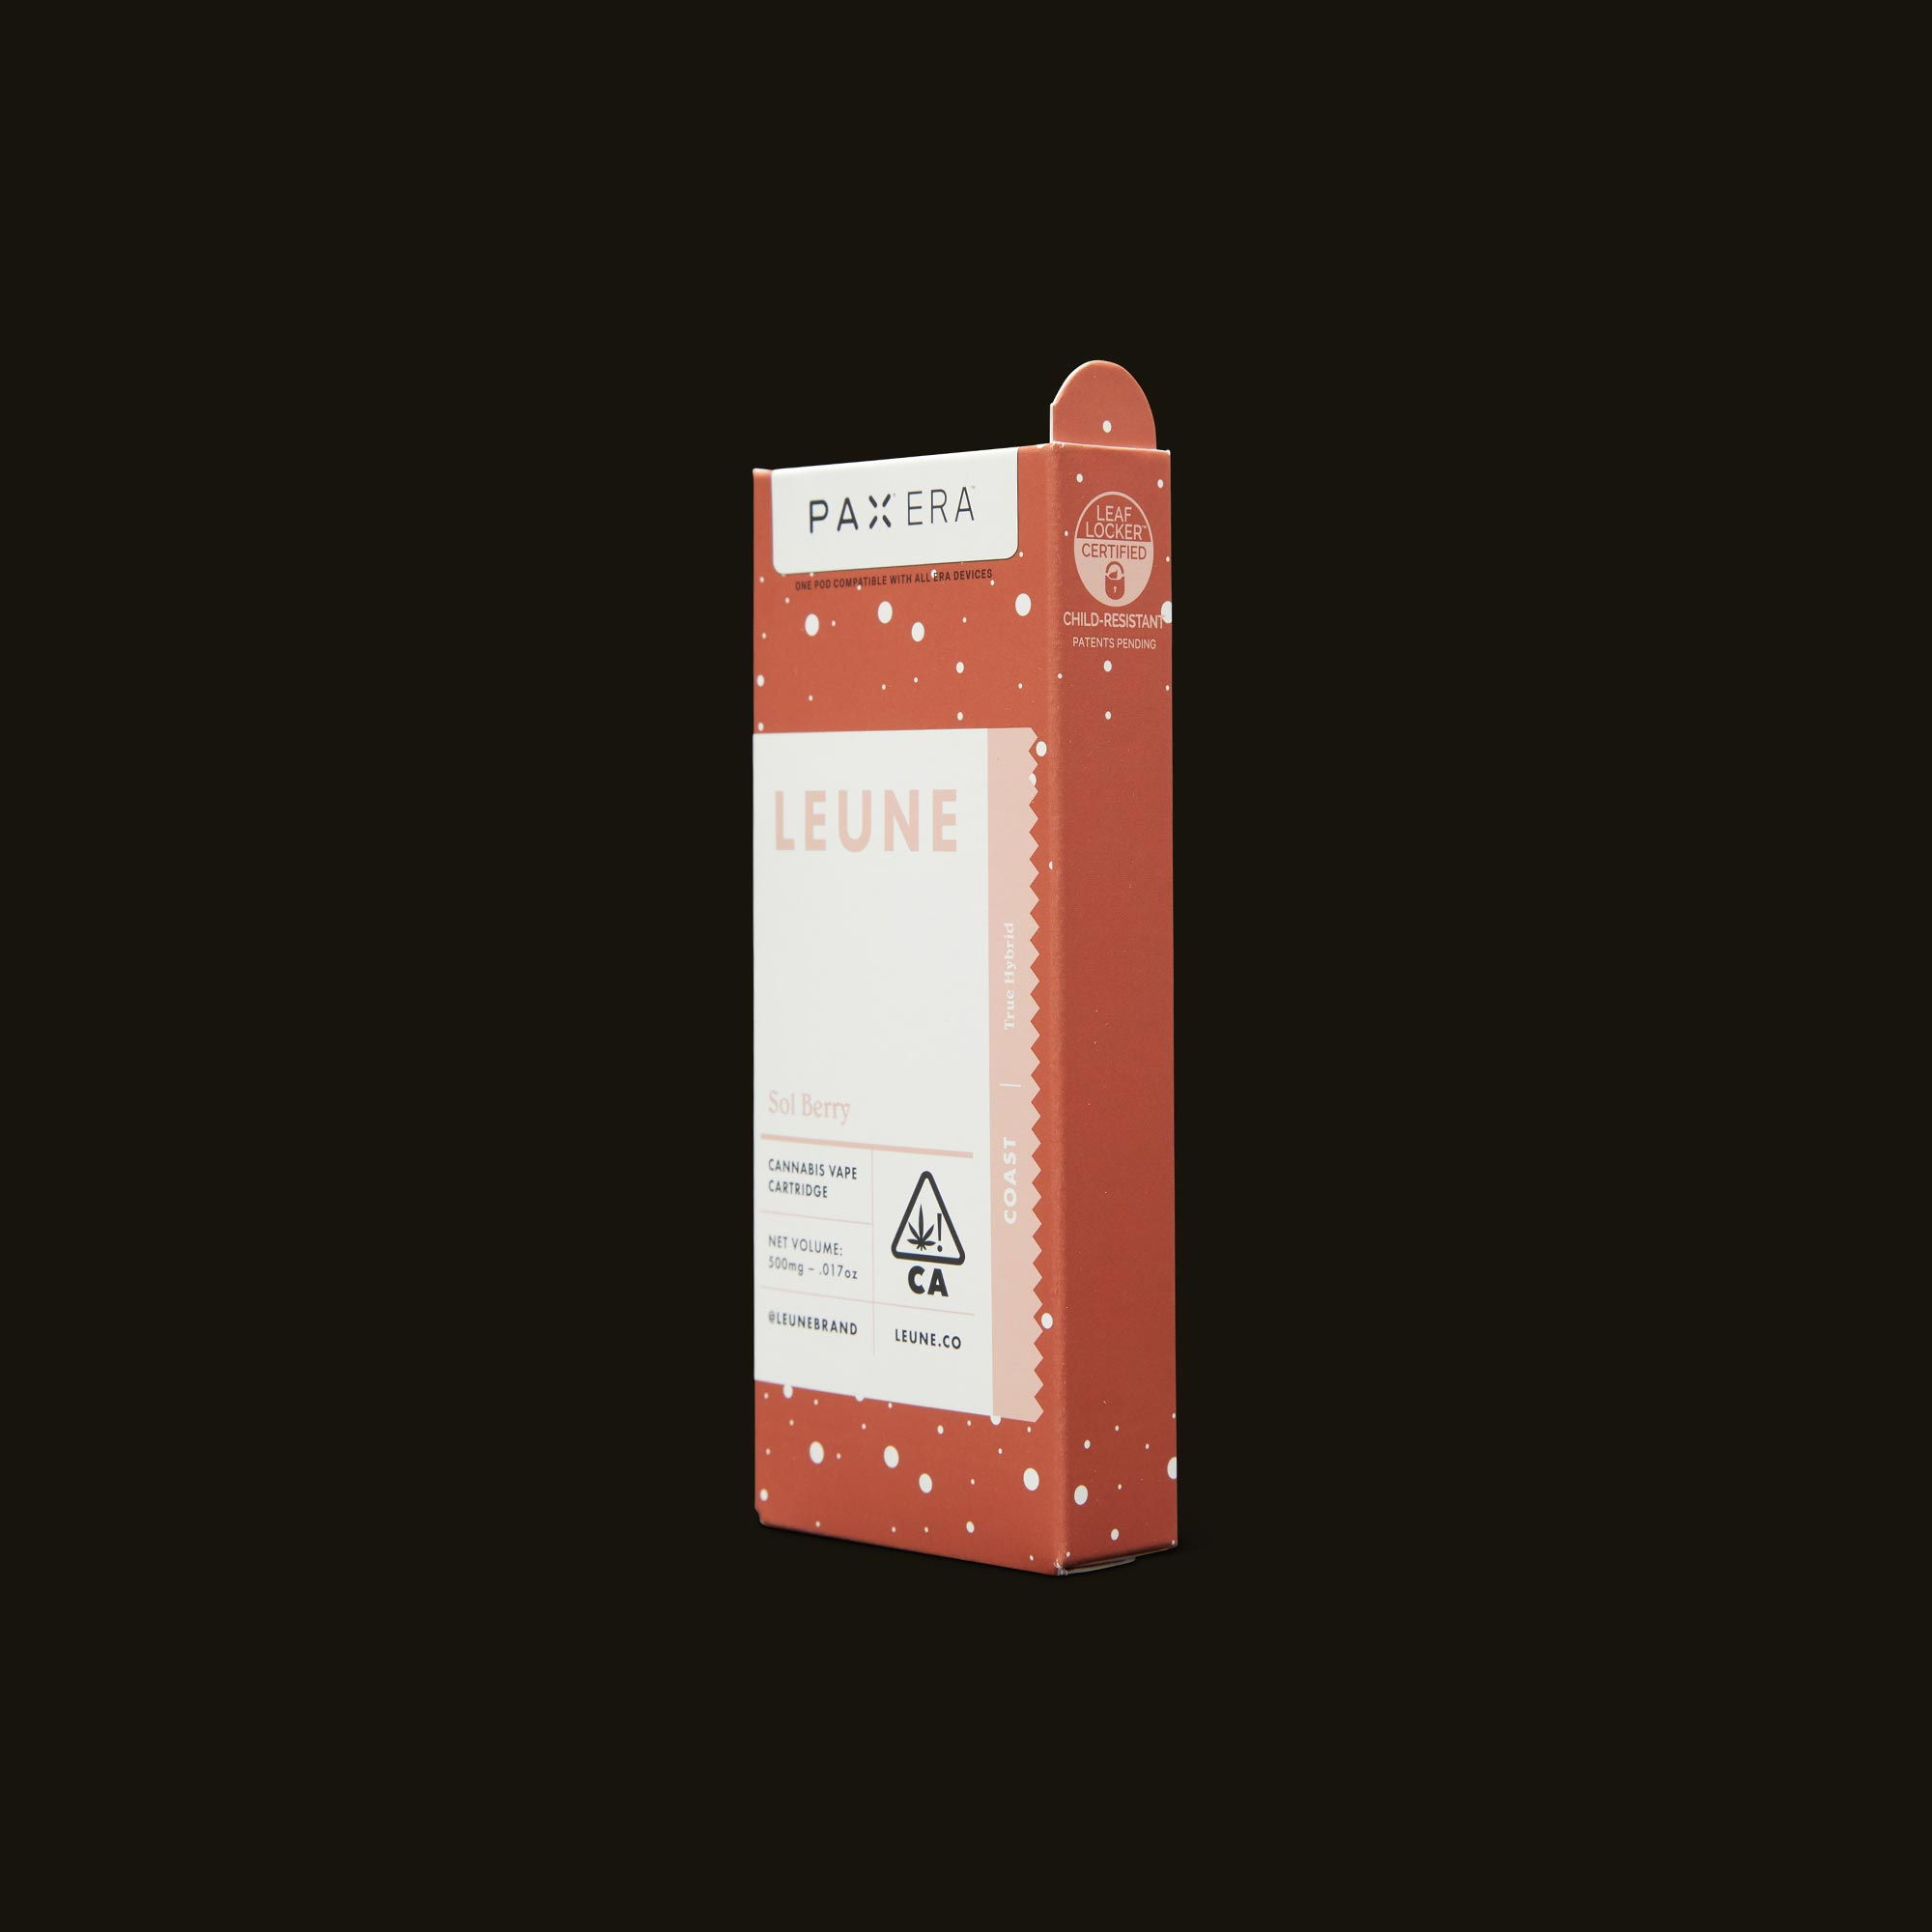 LEUNE Sol Berry PAX Era Pod Side Packaging